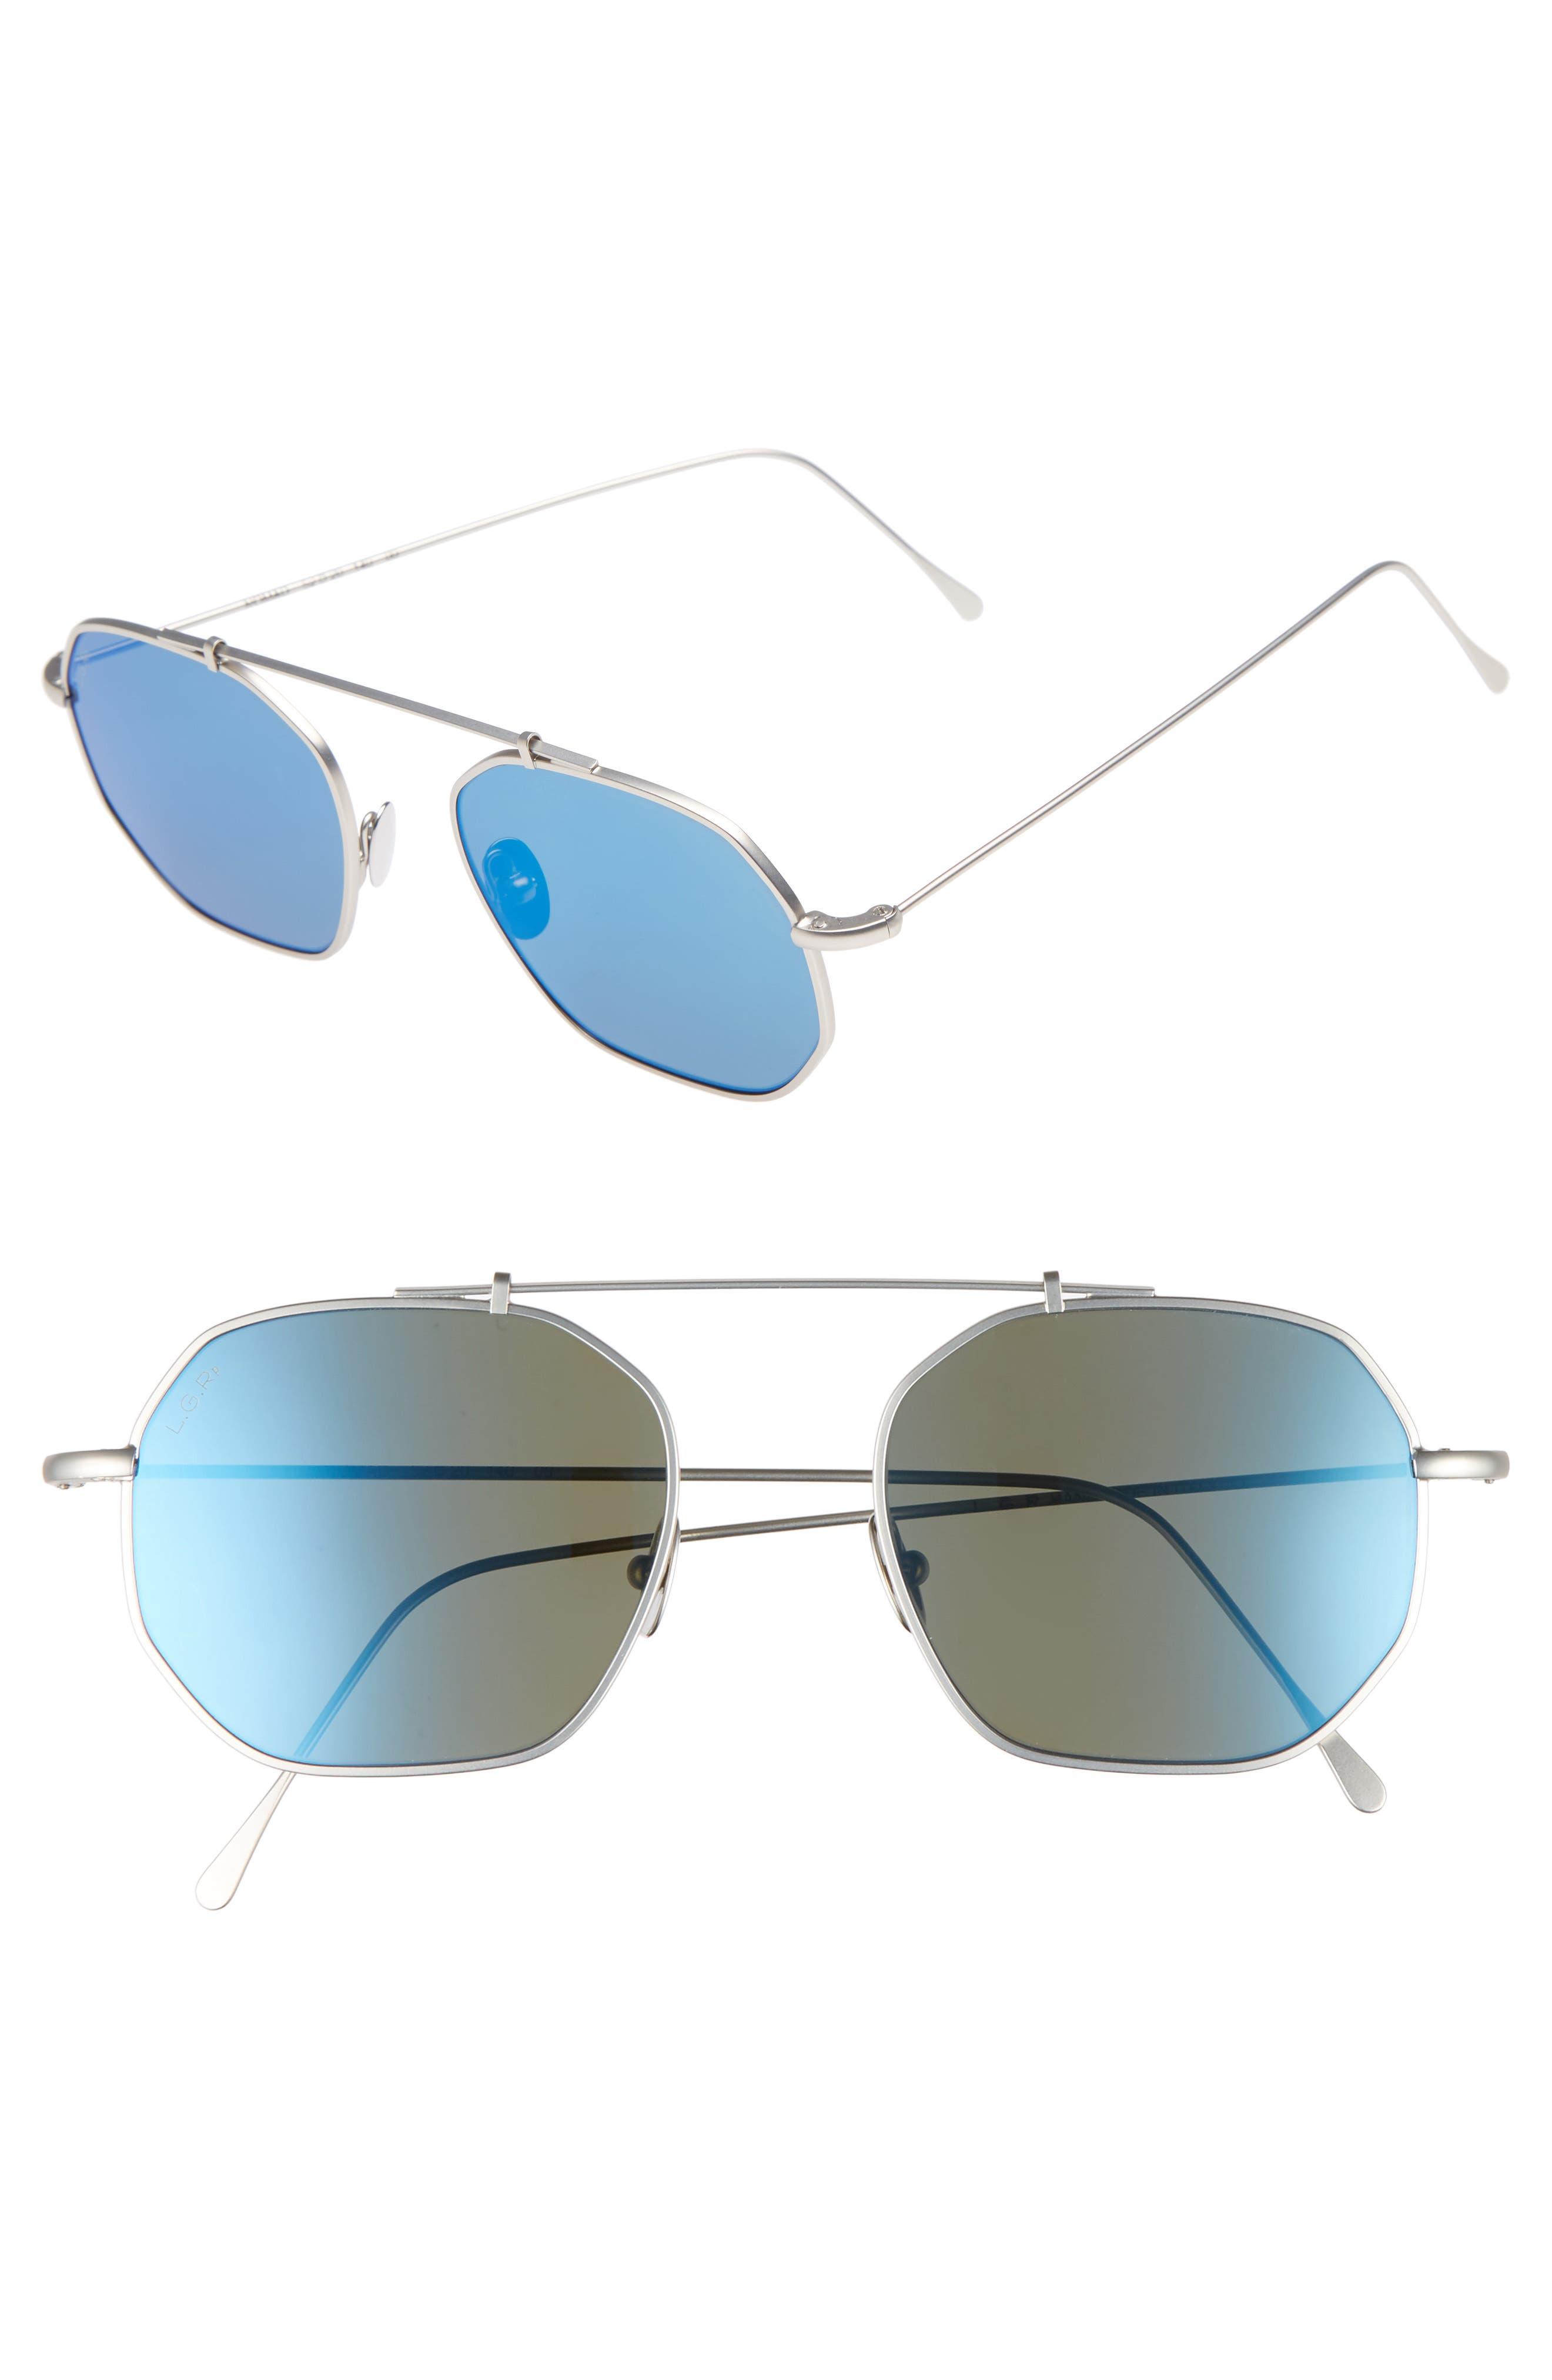 Nomad 52mm Polarized Sunglasses,                             Main thumbnail 1, color,                             Silver Matte/ Blue Mirror